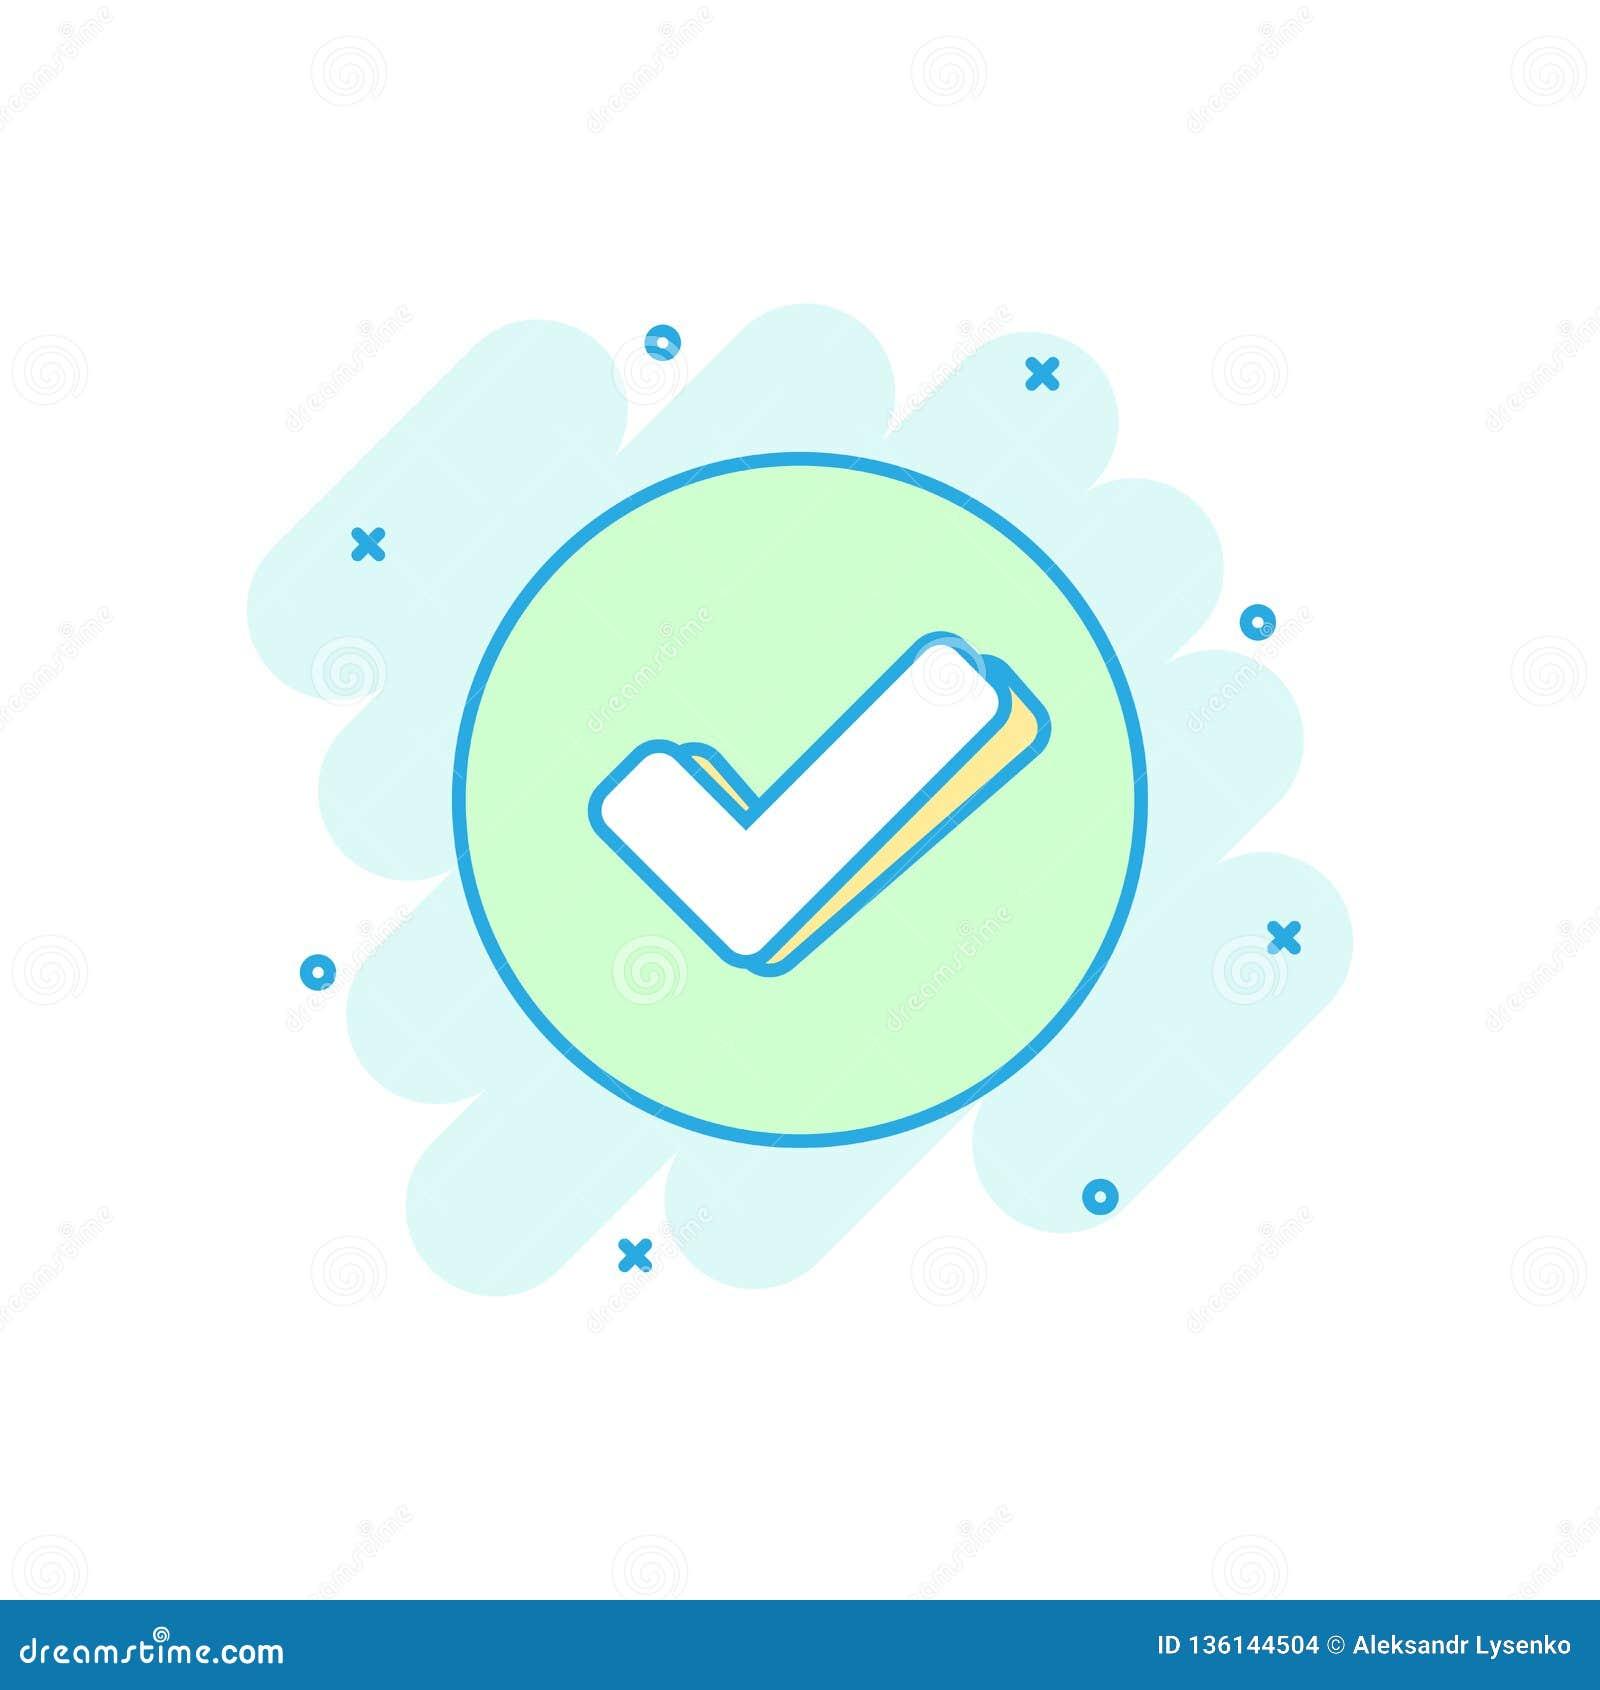 Check mark icon in comic style. Ok, accept vector cartoon illustration pictogram. Tick business concept splash effect